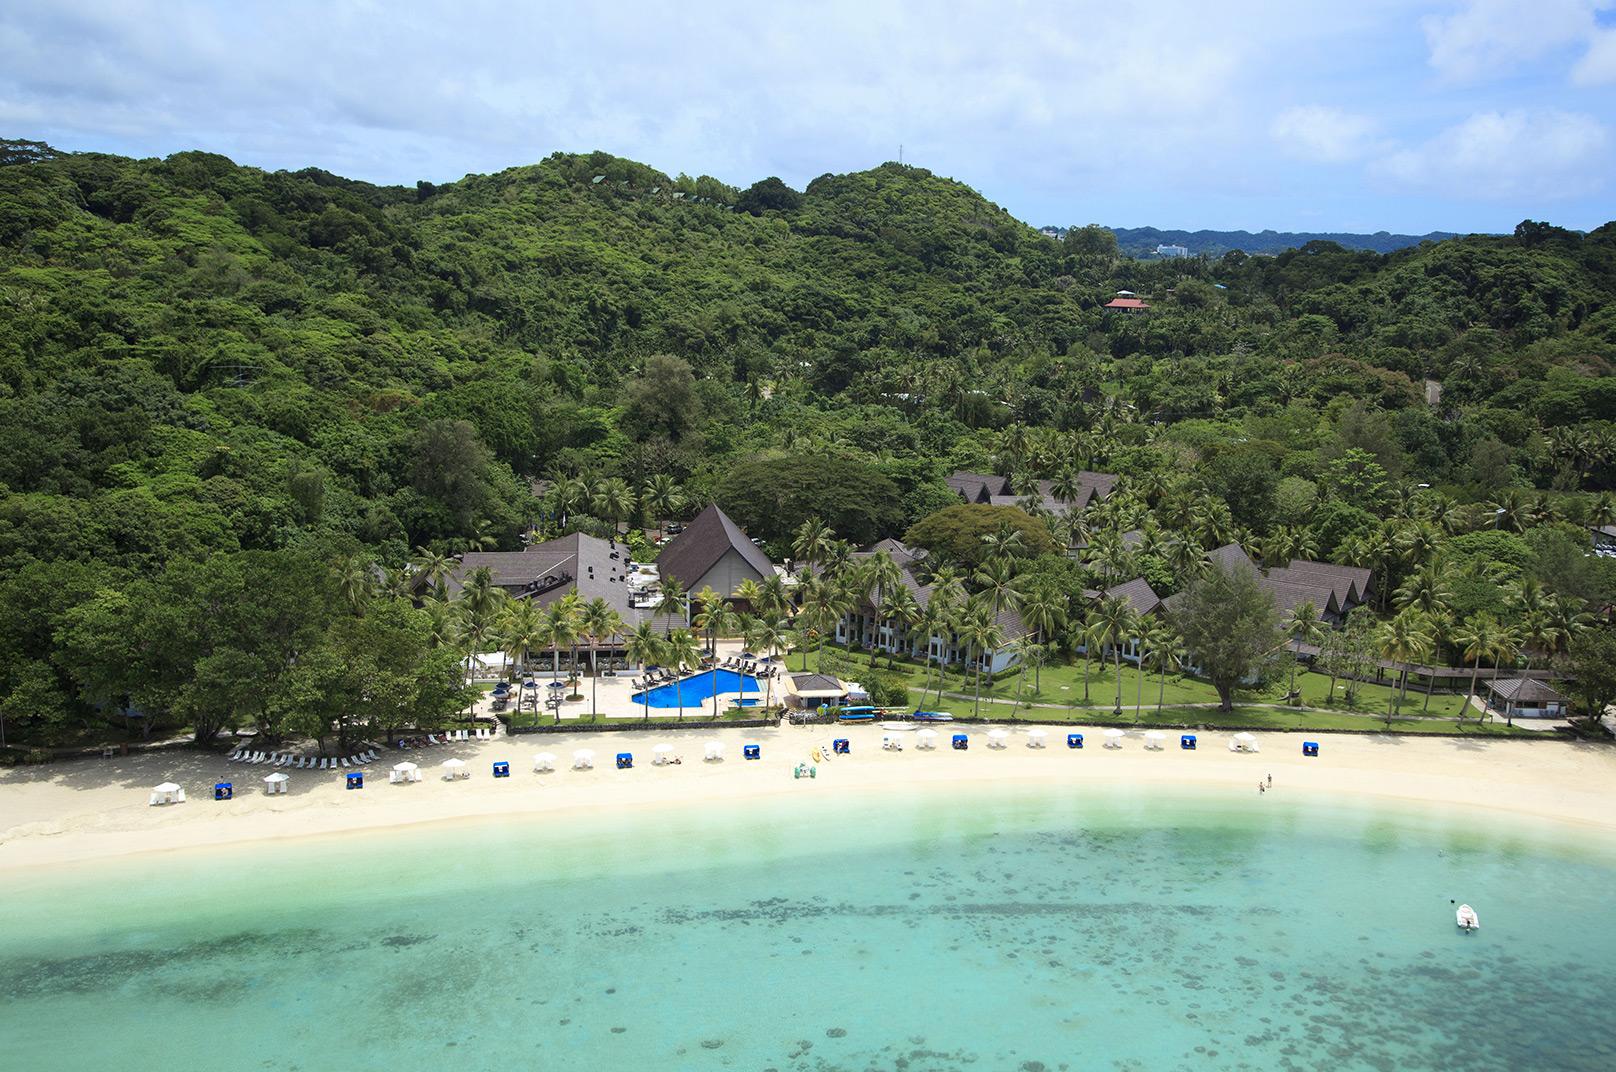 Palau dating site